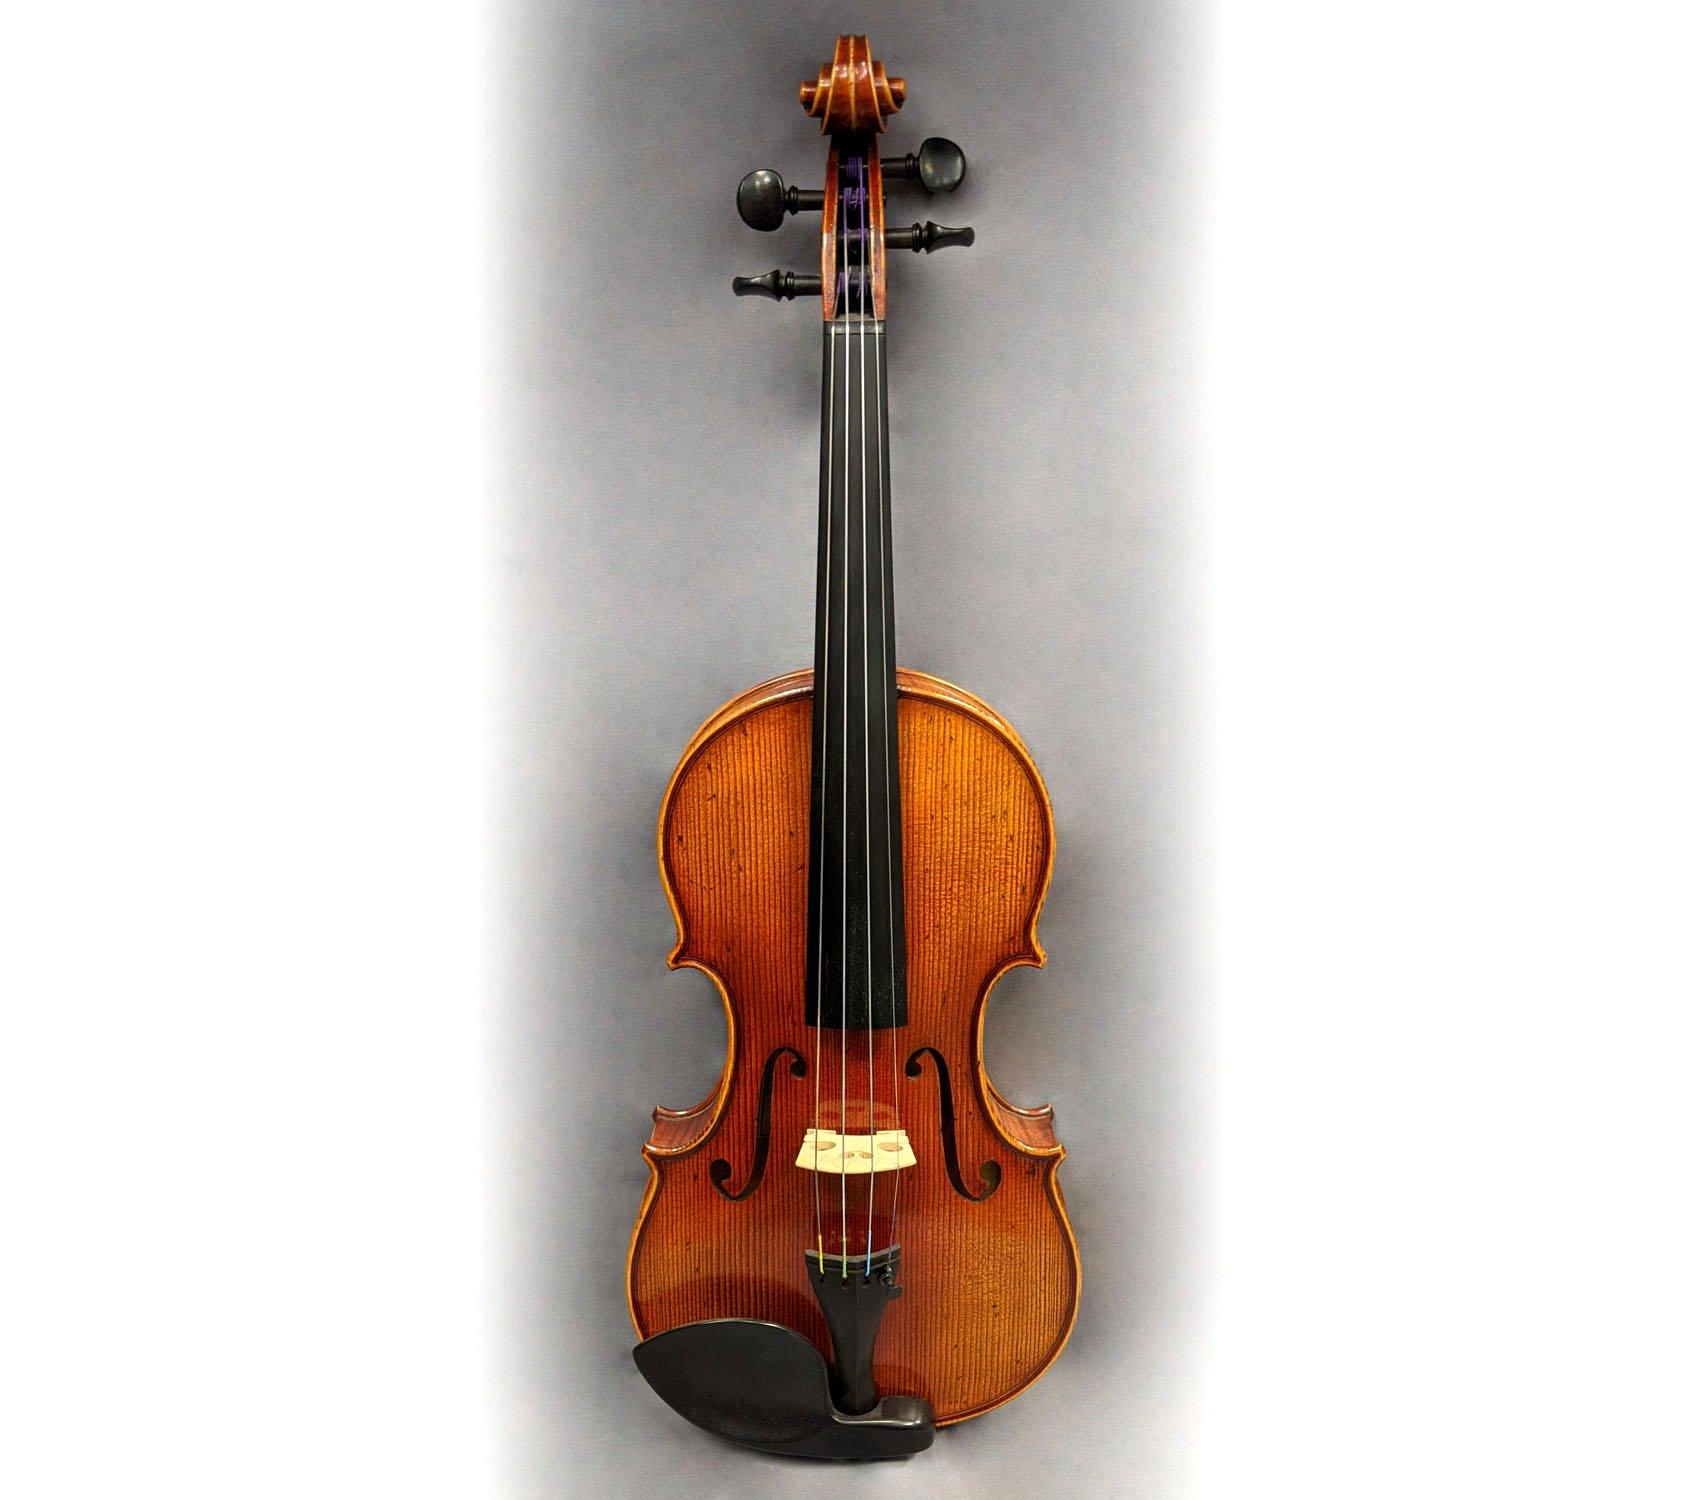 Artisan Model 800 4/4 Violin Outfit